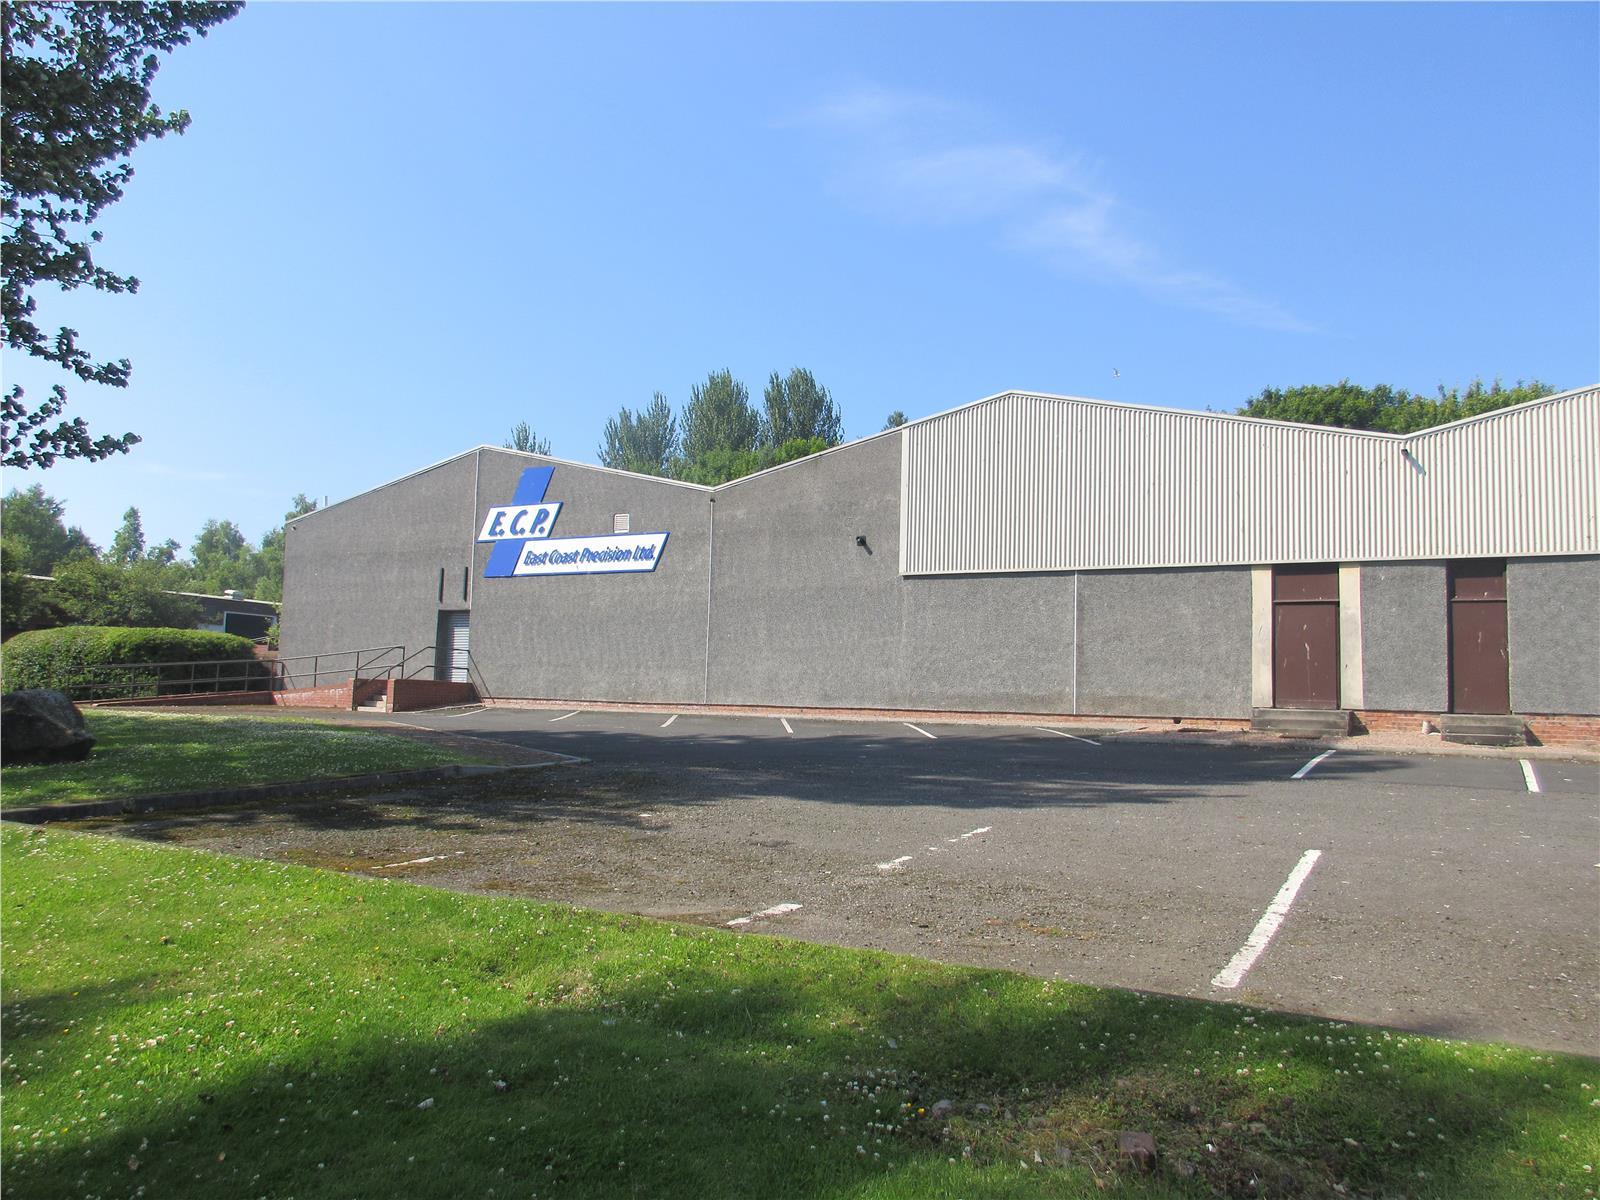 59 Nasmyth Road, Southfield Industrial Estate, Glenrothes, Fife